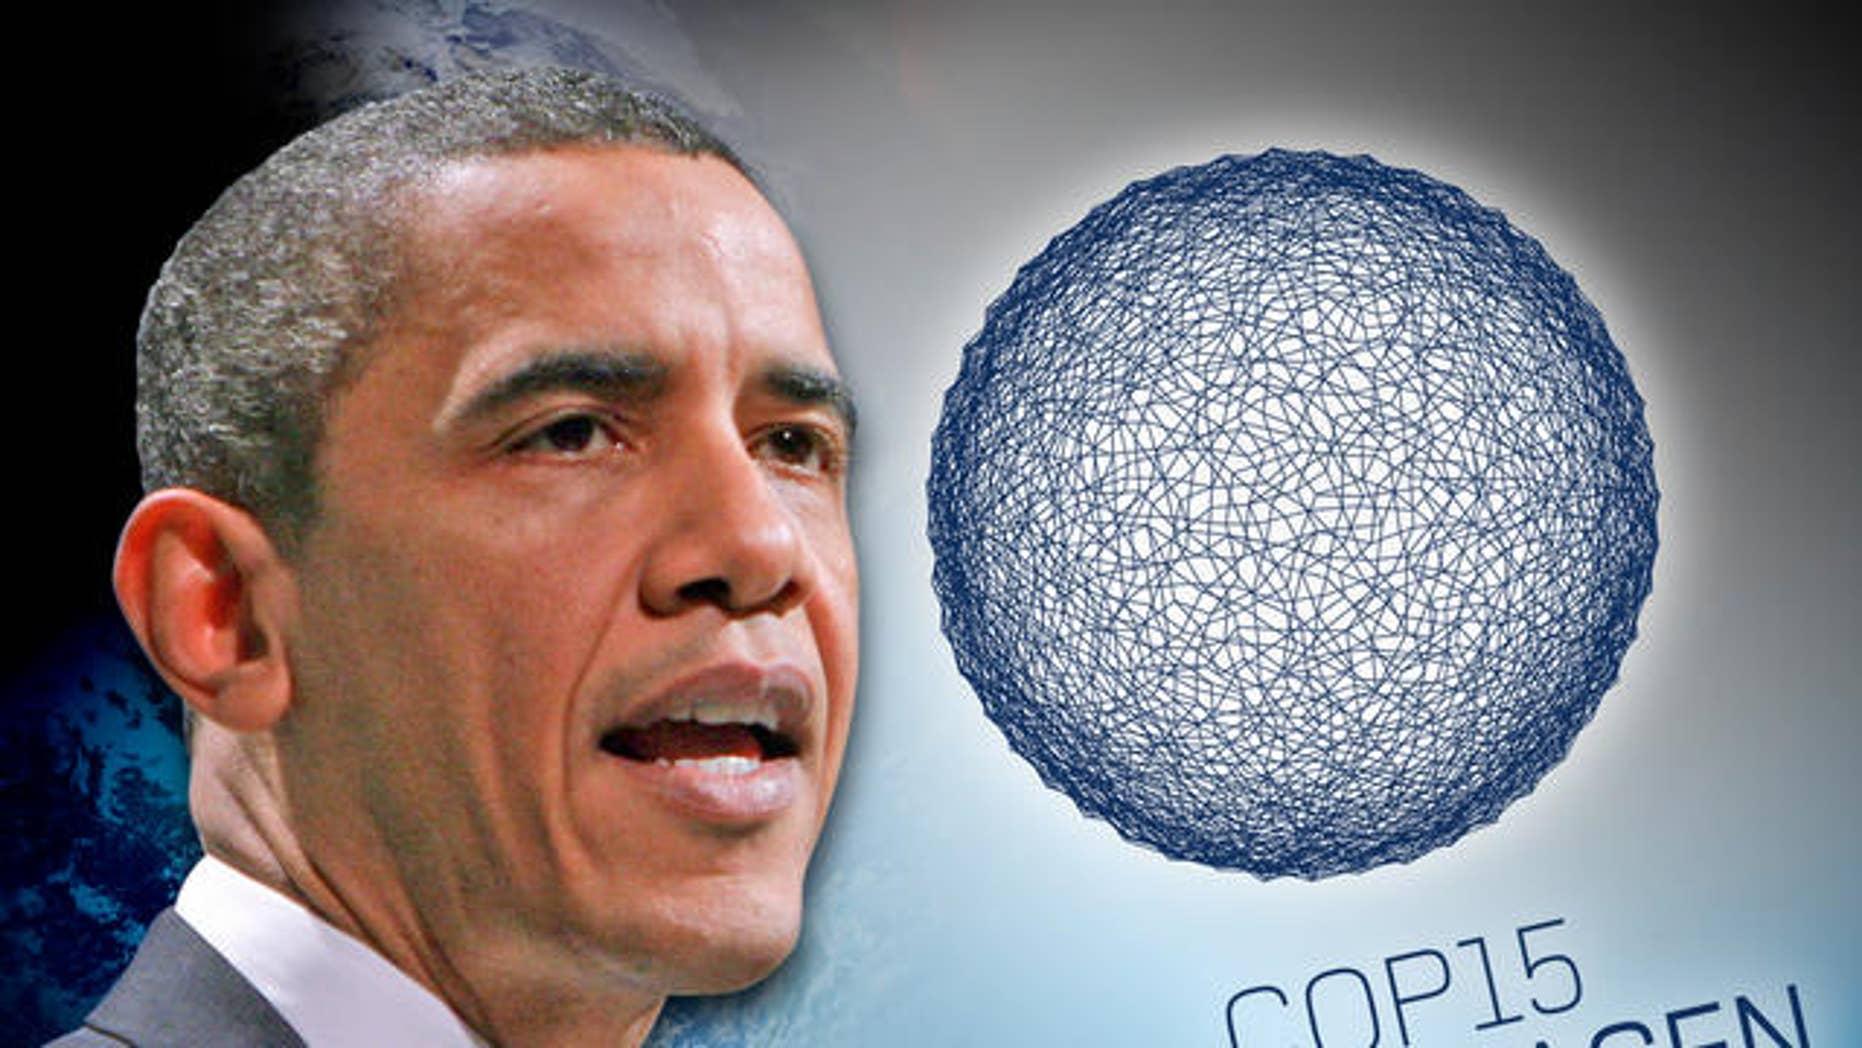 President Obama speaks at a climate change conference in Copenhagen, Denmark (AP)